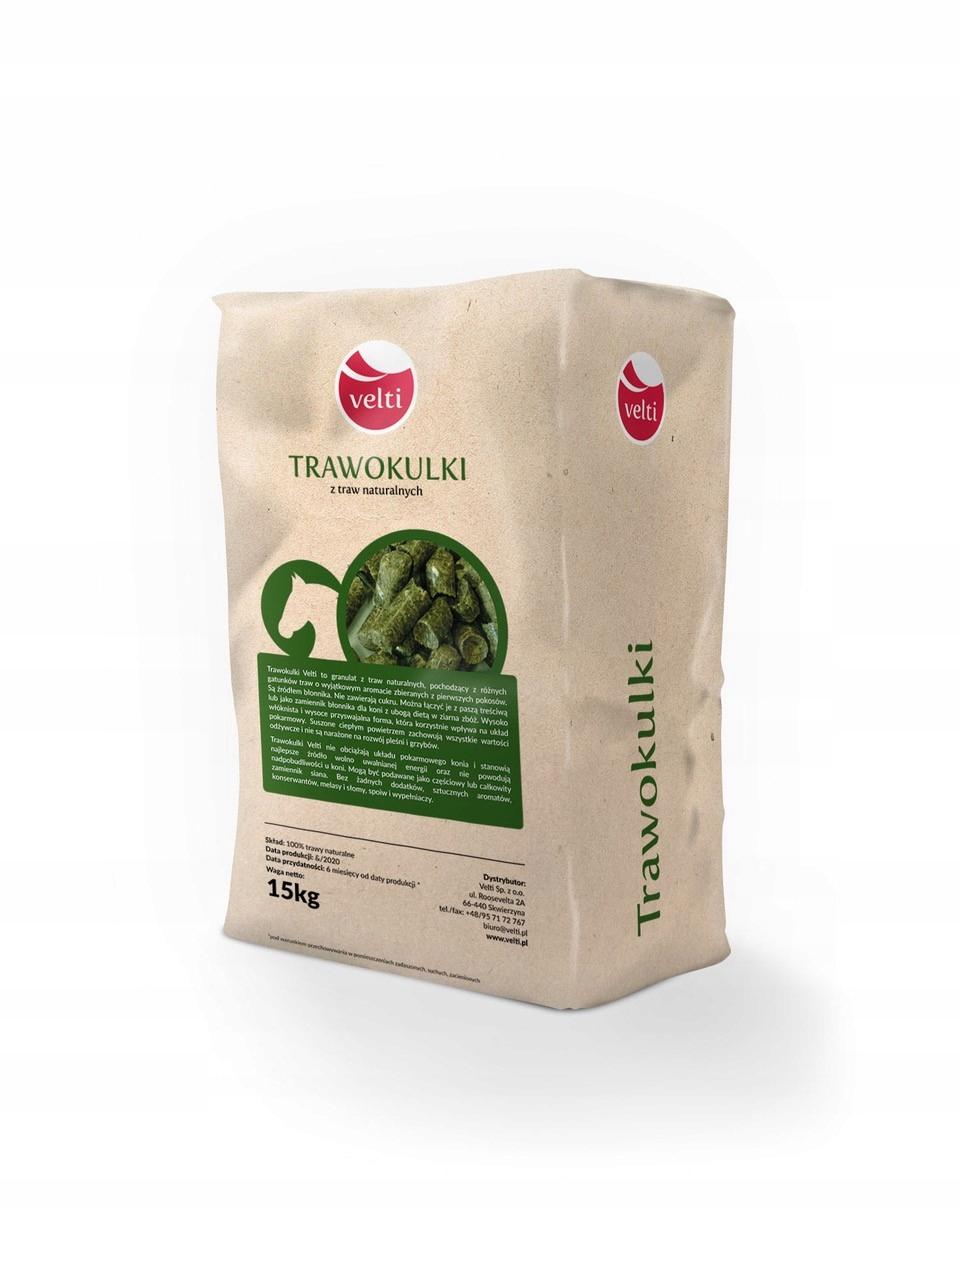 Trawokki Velti 30 кг Натуральные травяные гранулы